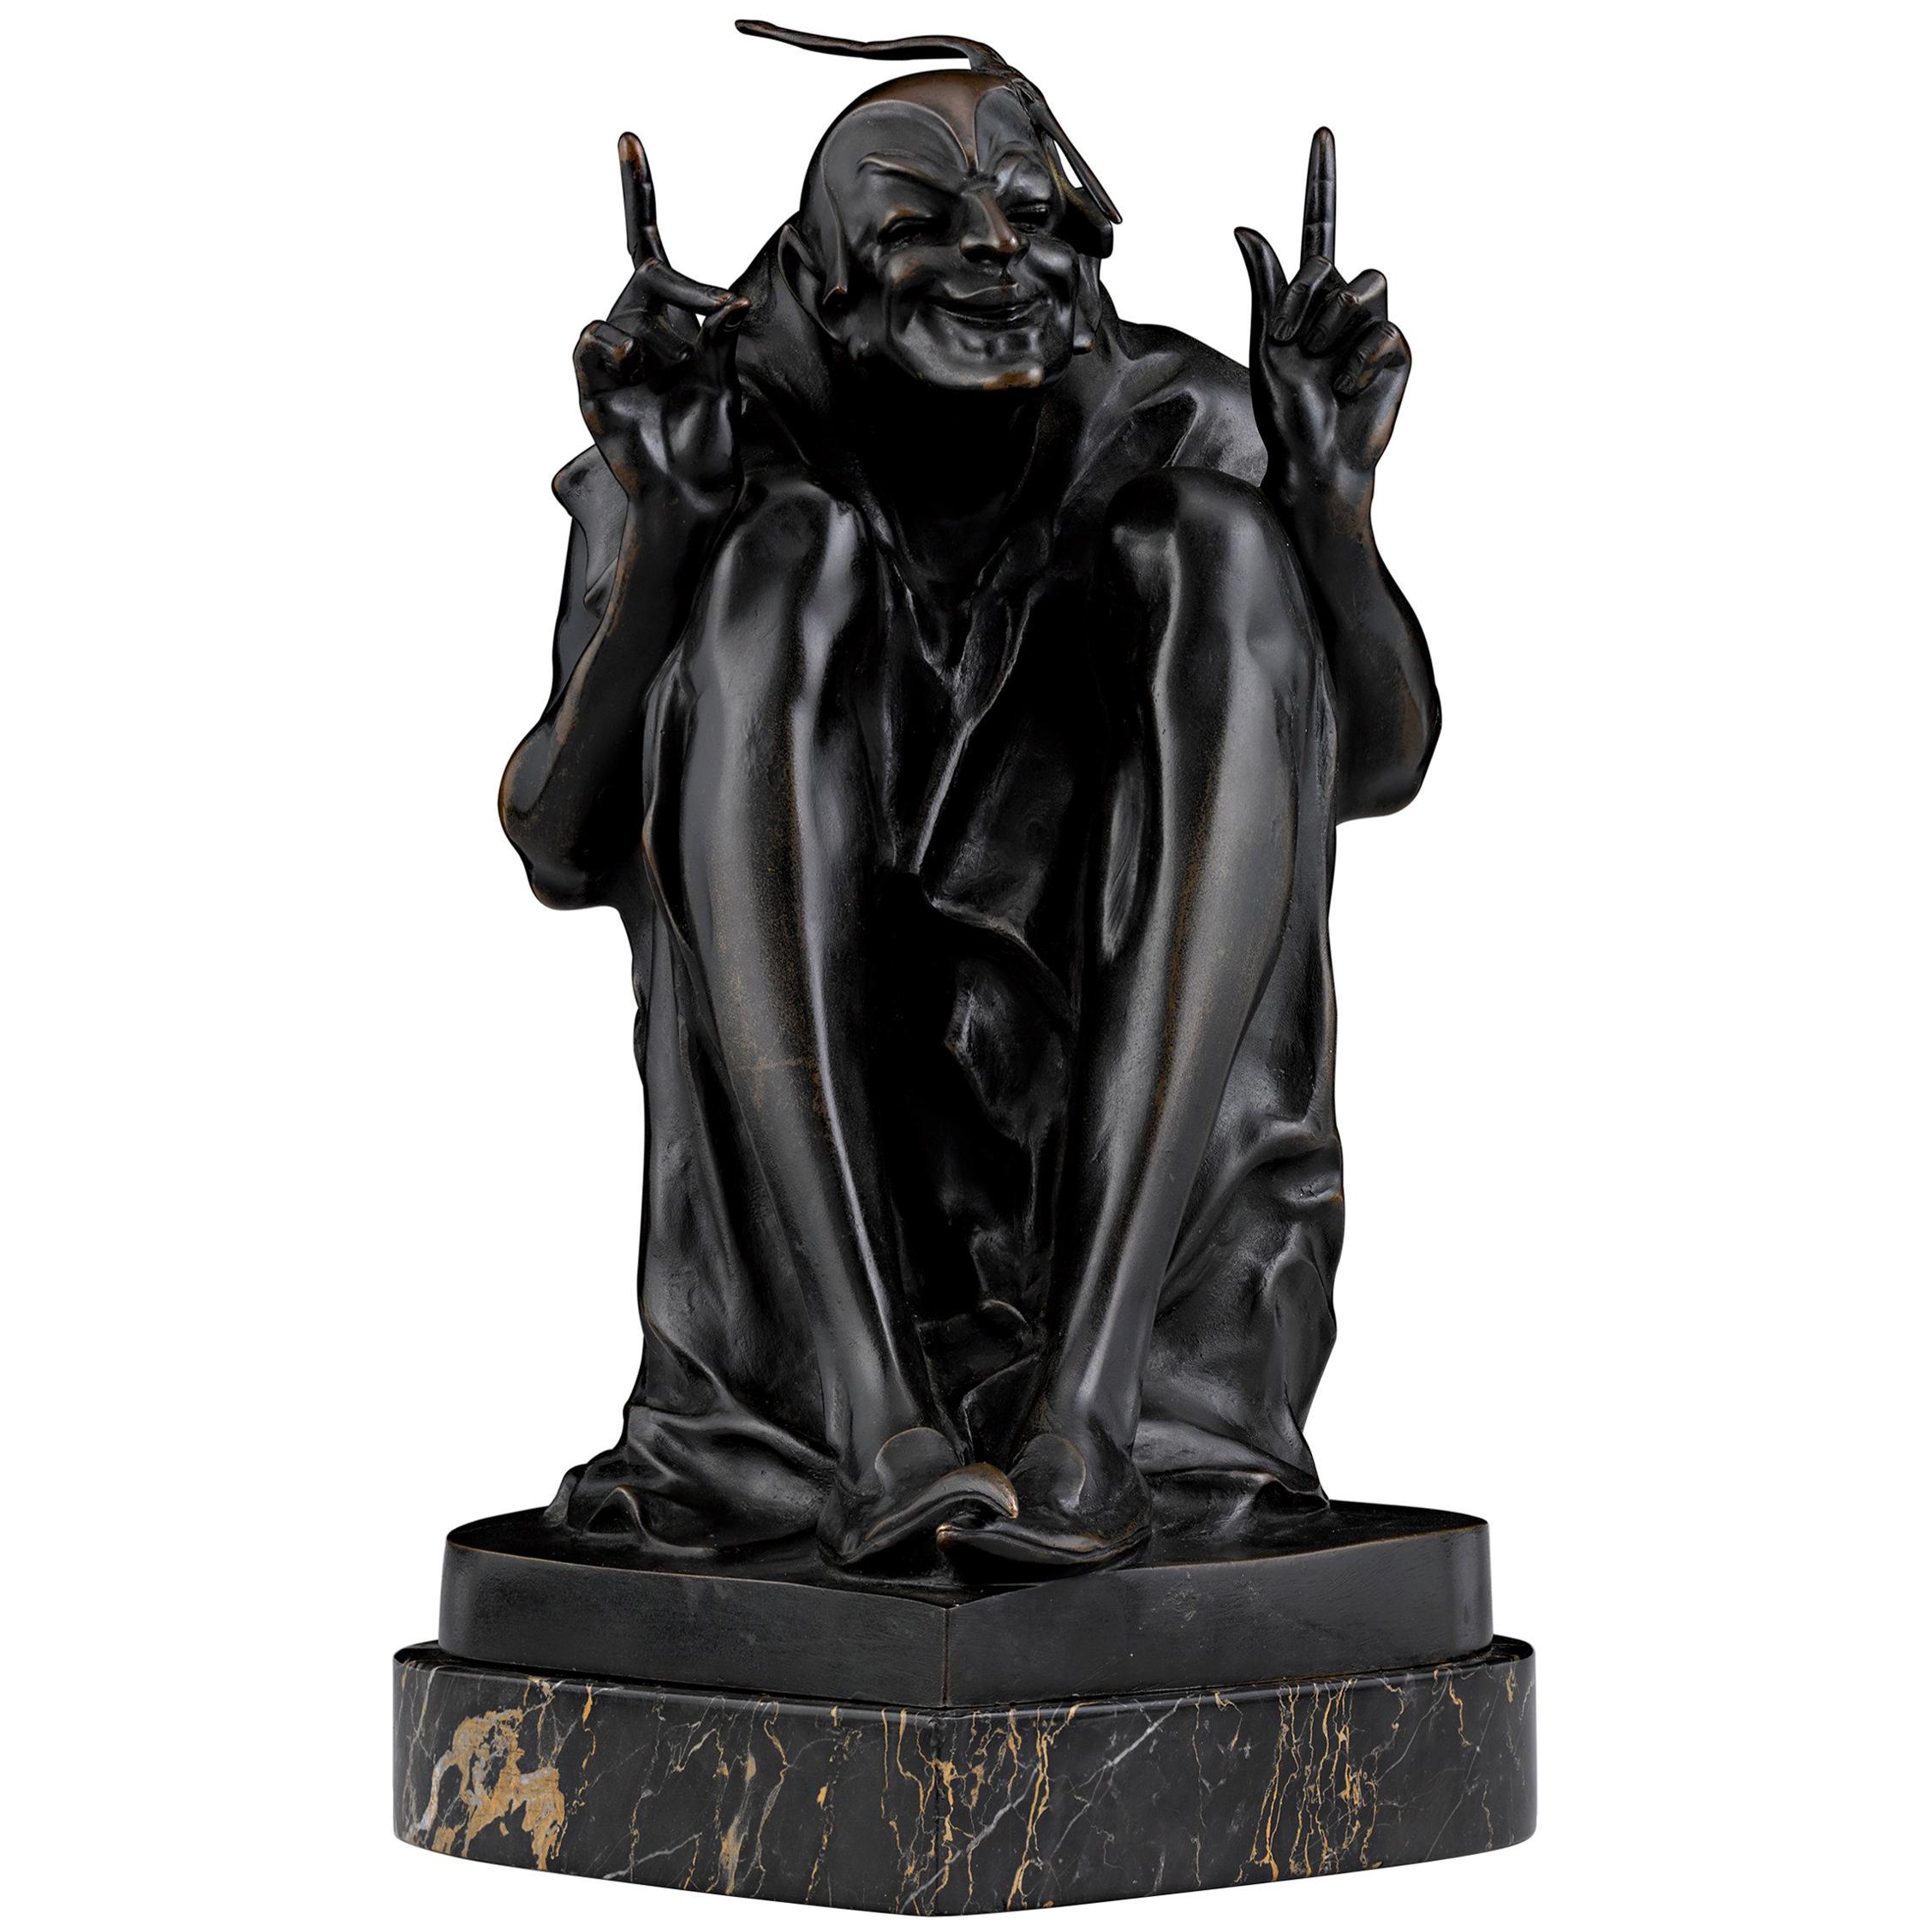 The Hugger Erotic Bronze Attributed to Bruno Zach